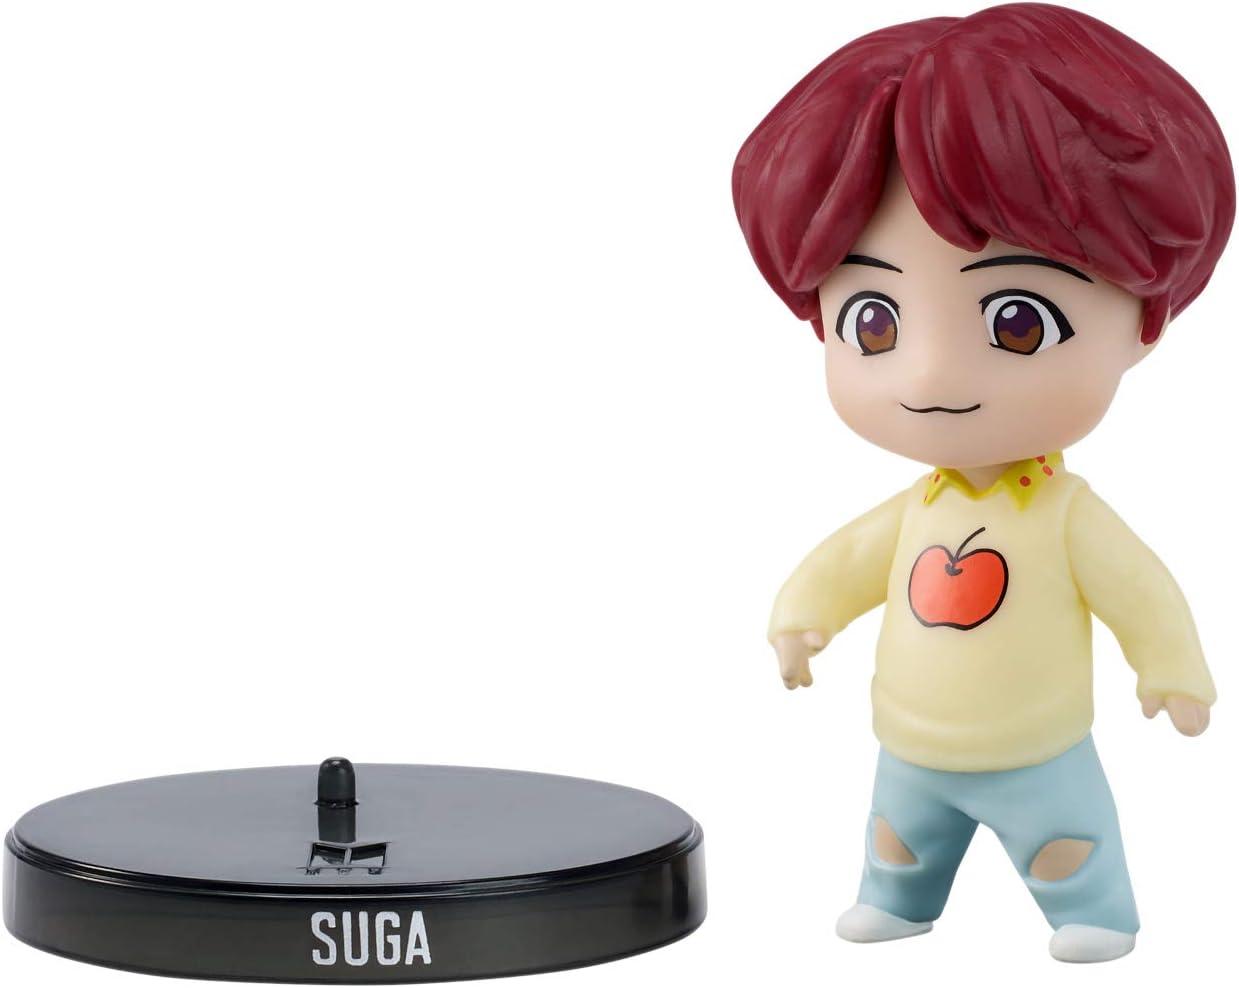 Amazon.com: Mattel BTS Mini Doll 6: Toys & Games